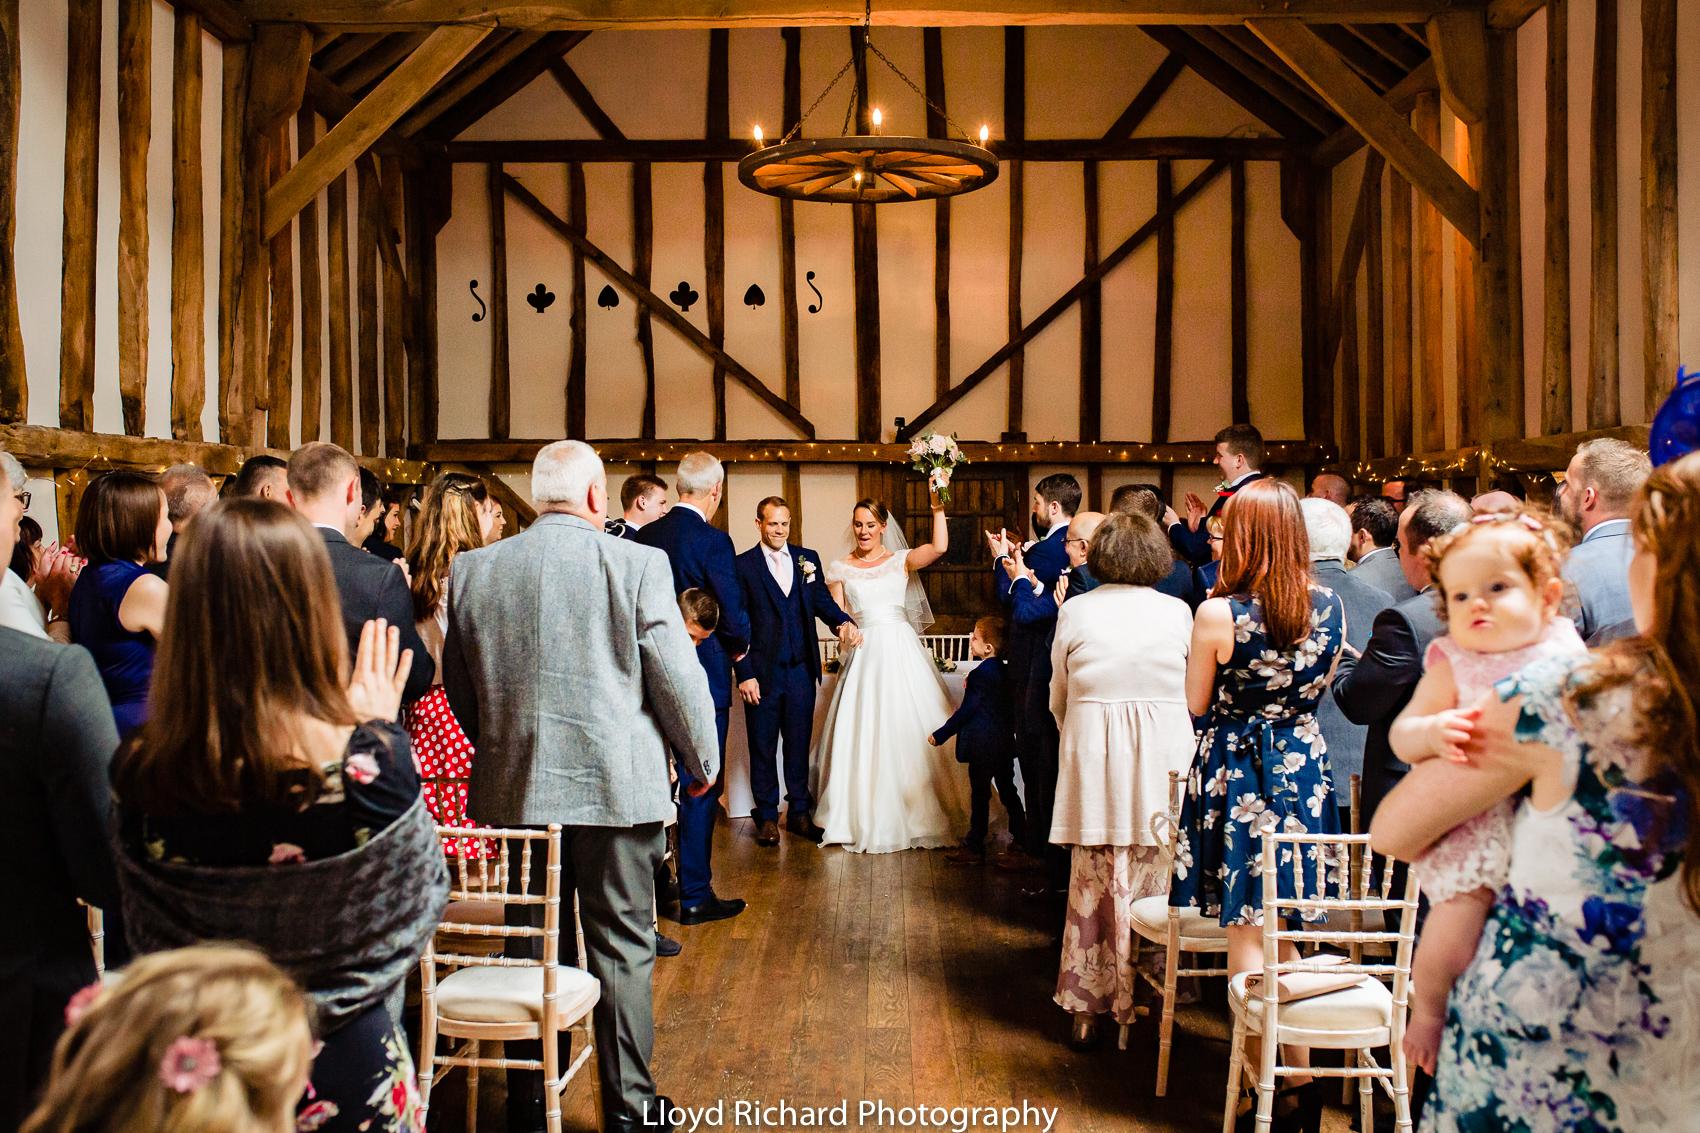 bride celebrating wedding at Pitt Hall Barn